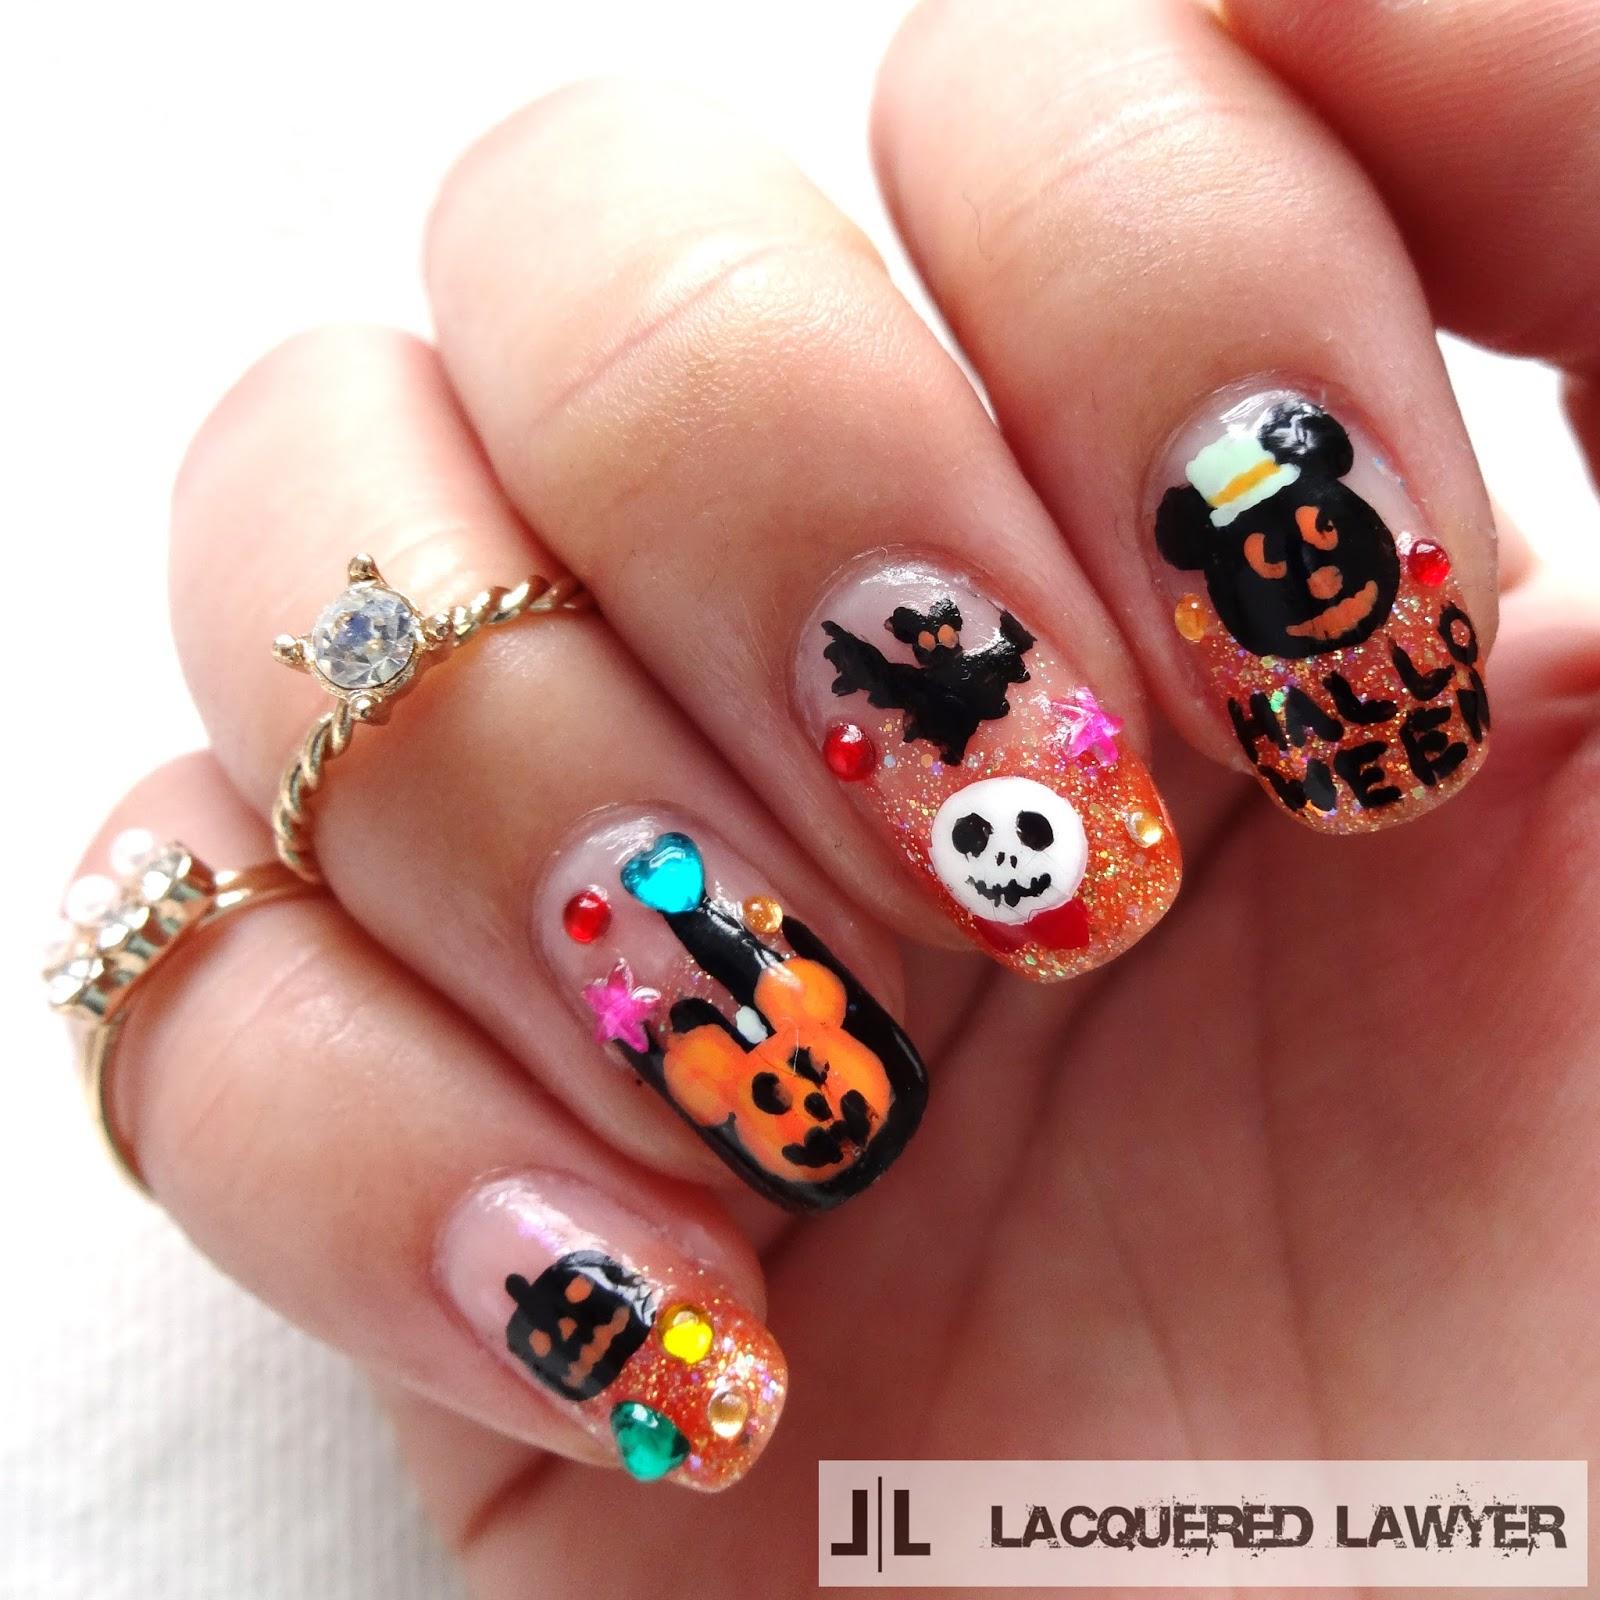 Lacquered Lawyer | Nail Art Blog: Disney Halloween